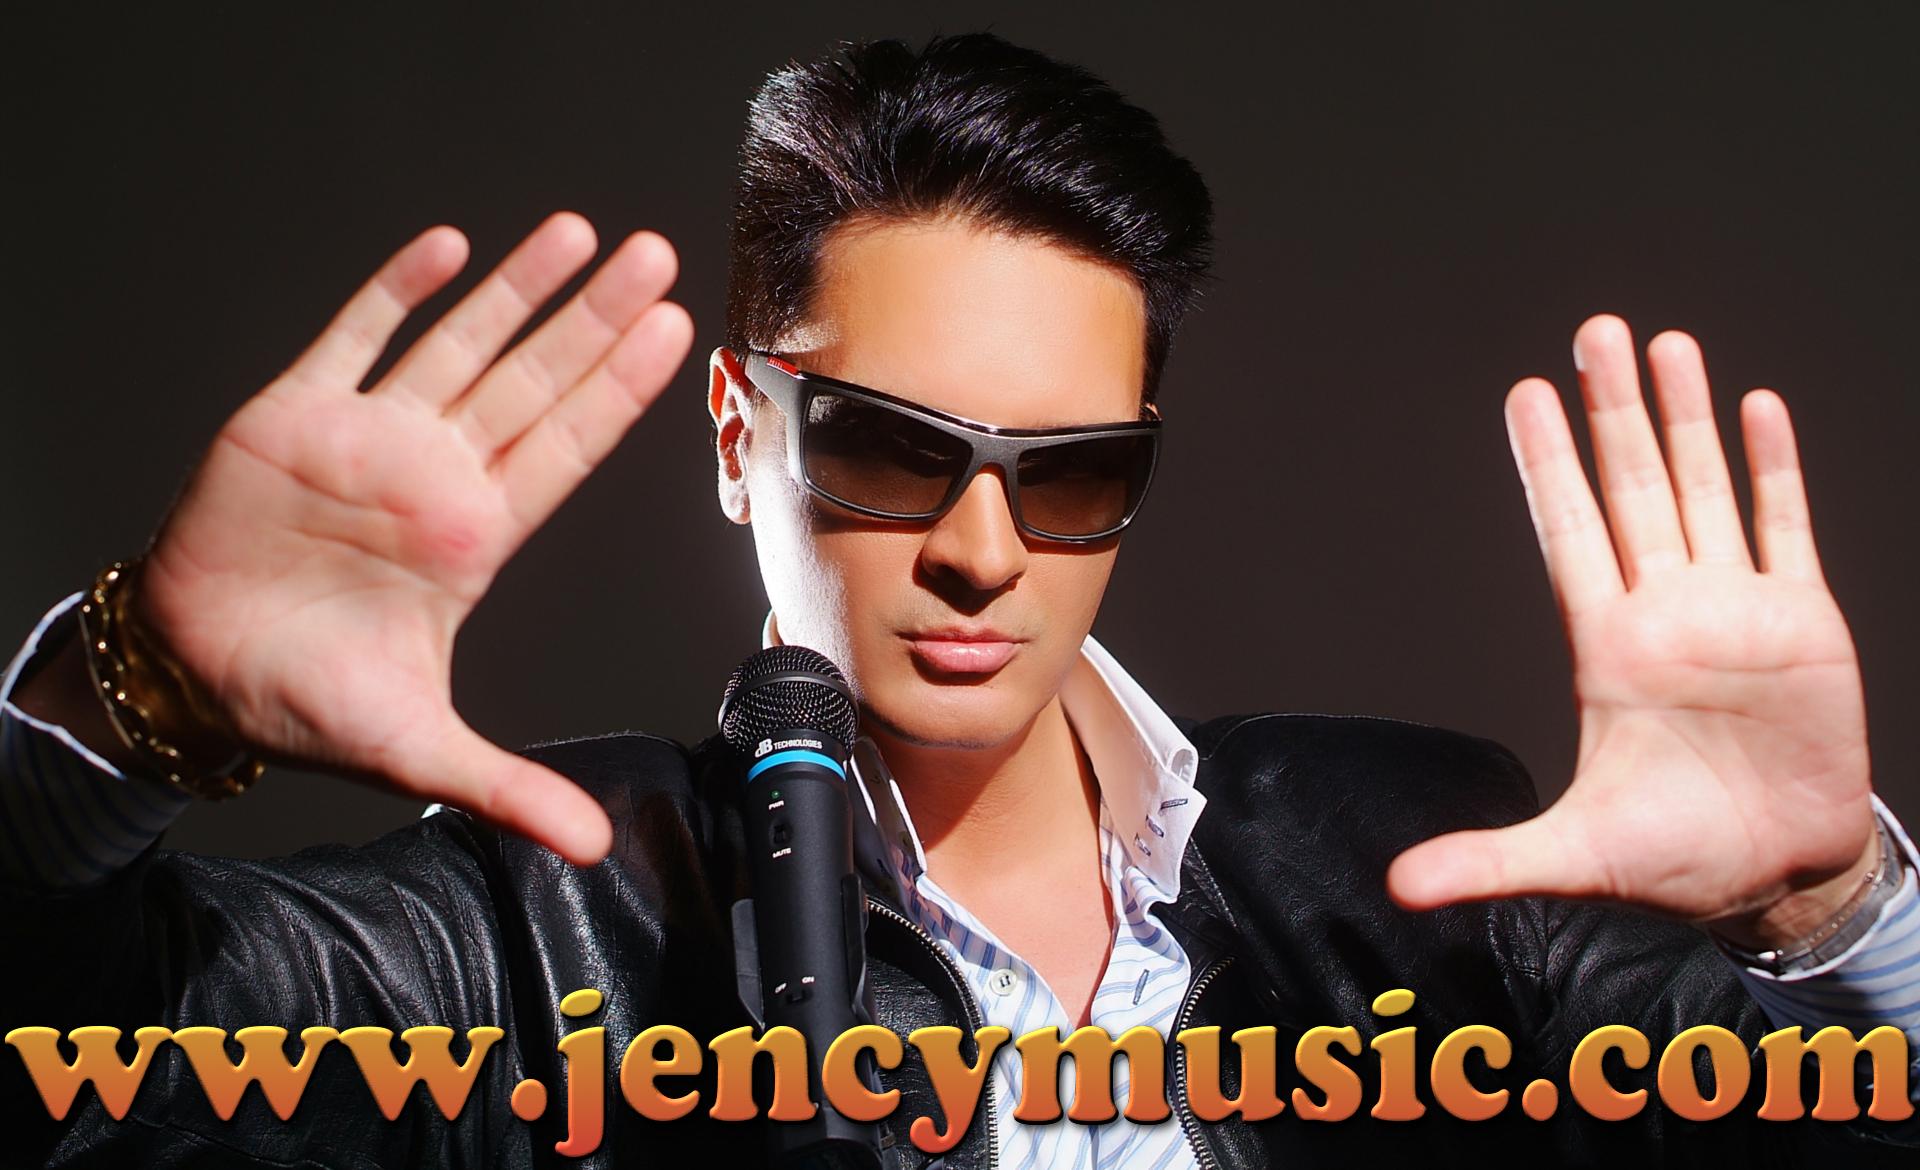 jencymusic.com2